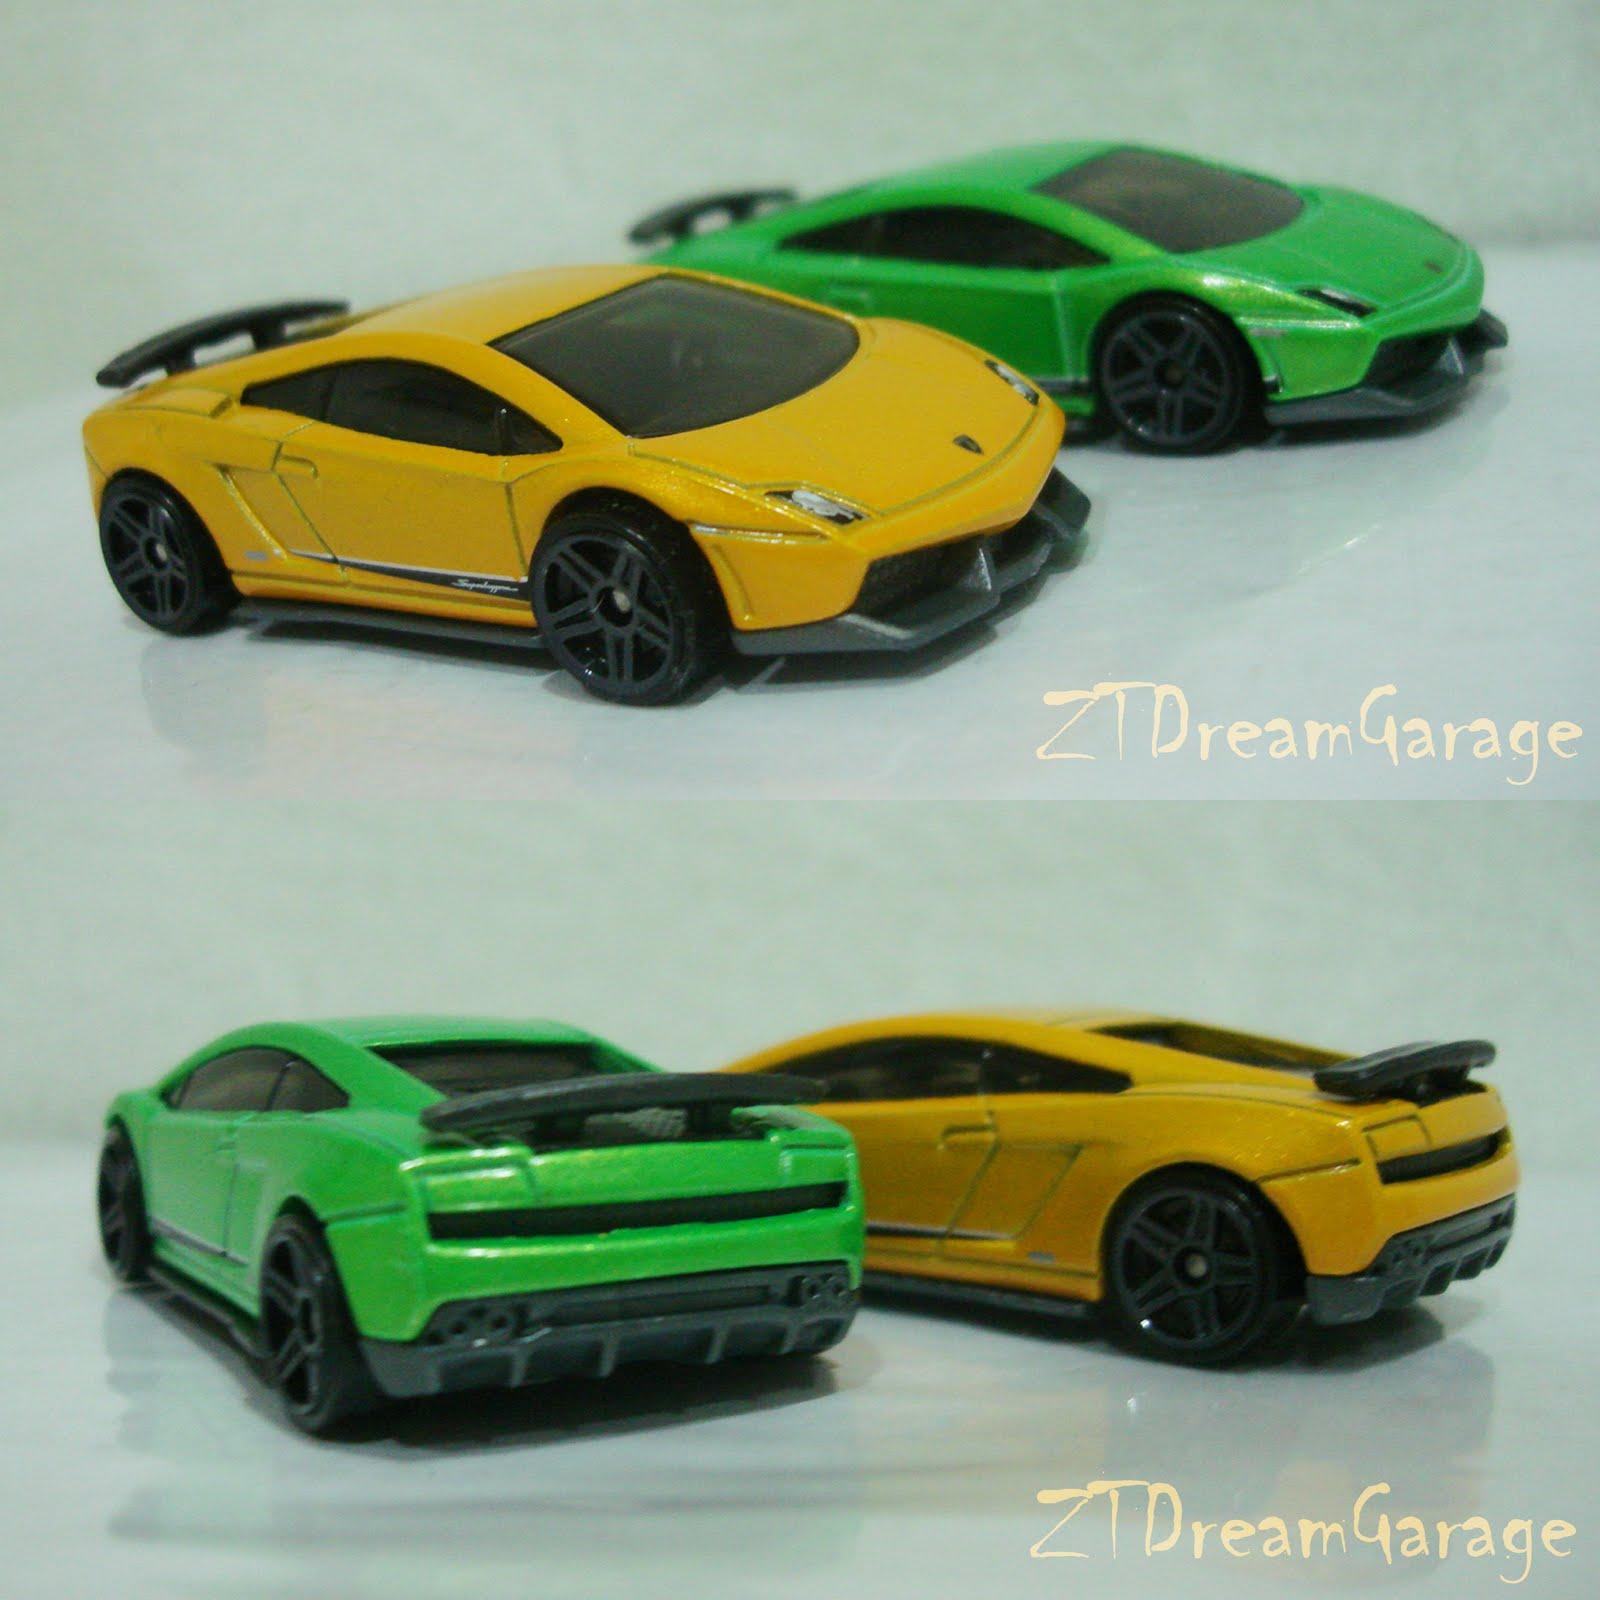 2011 Lamborghini Gallardo Exterior: ZT's Dream Garage: LP570-4 Superleggera